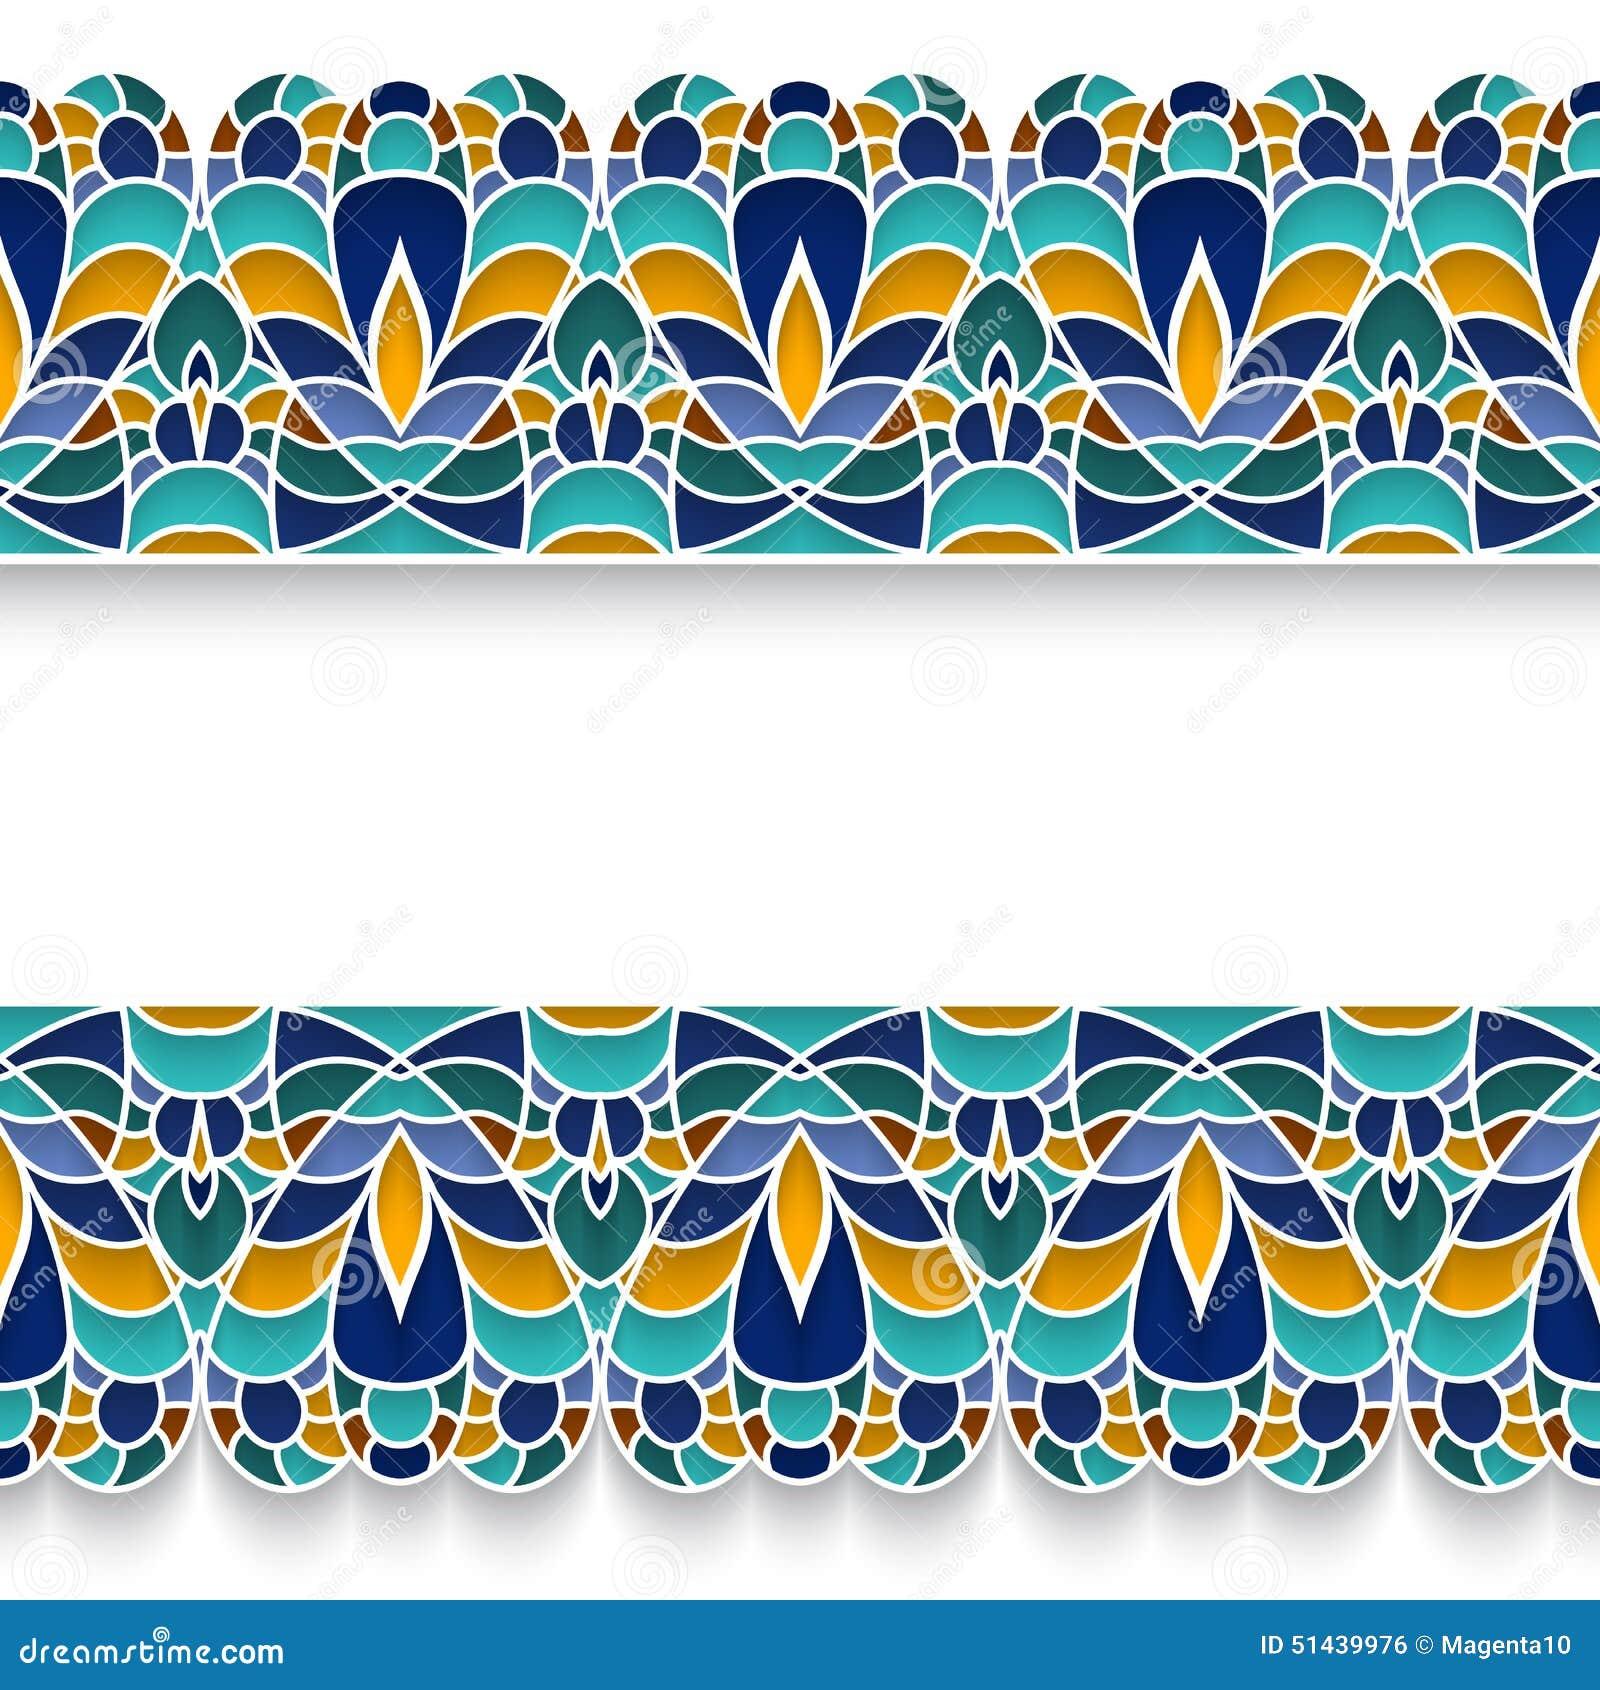 mosaic borders